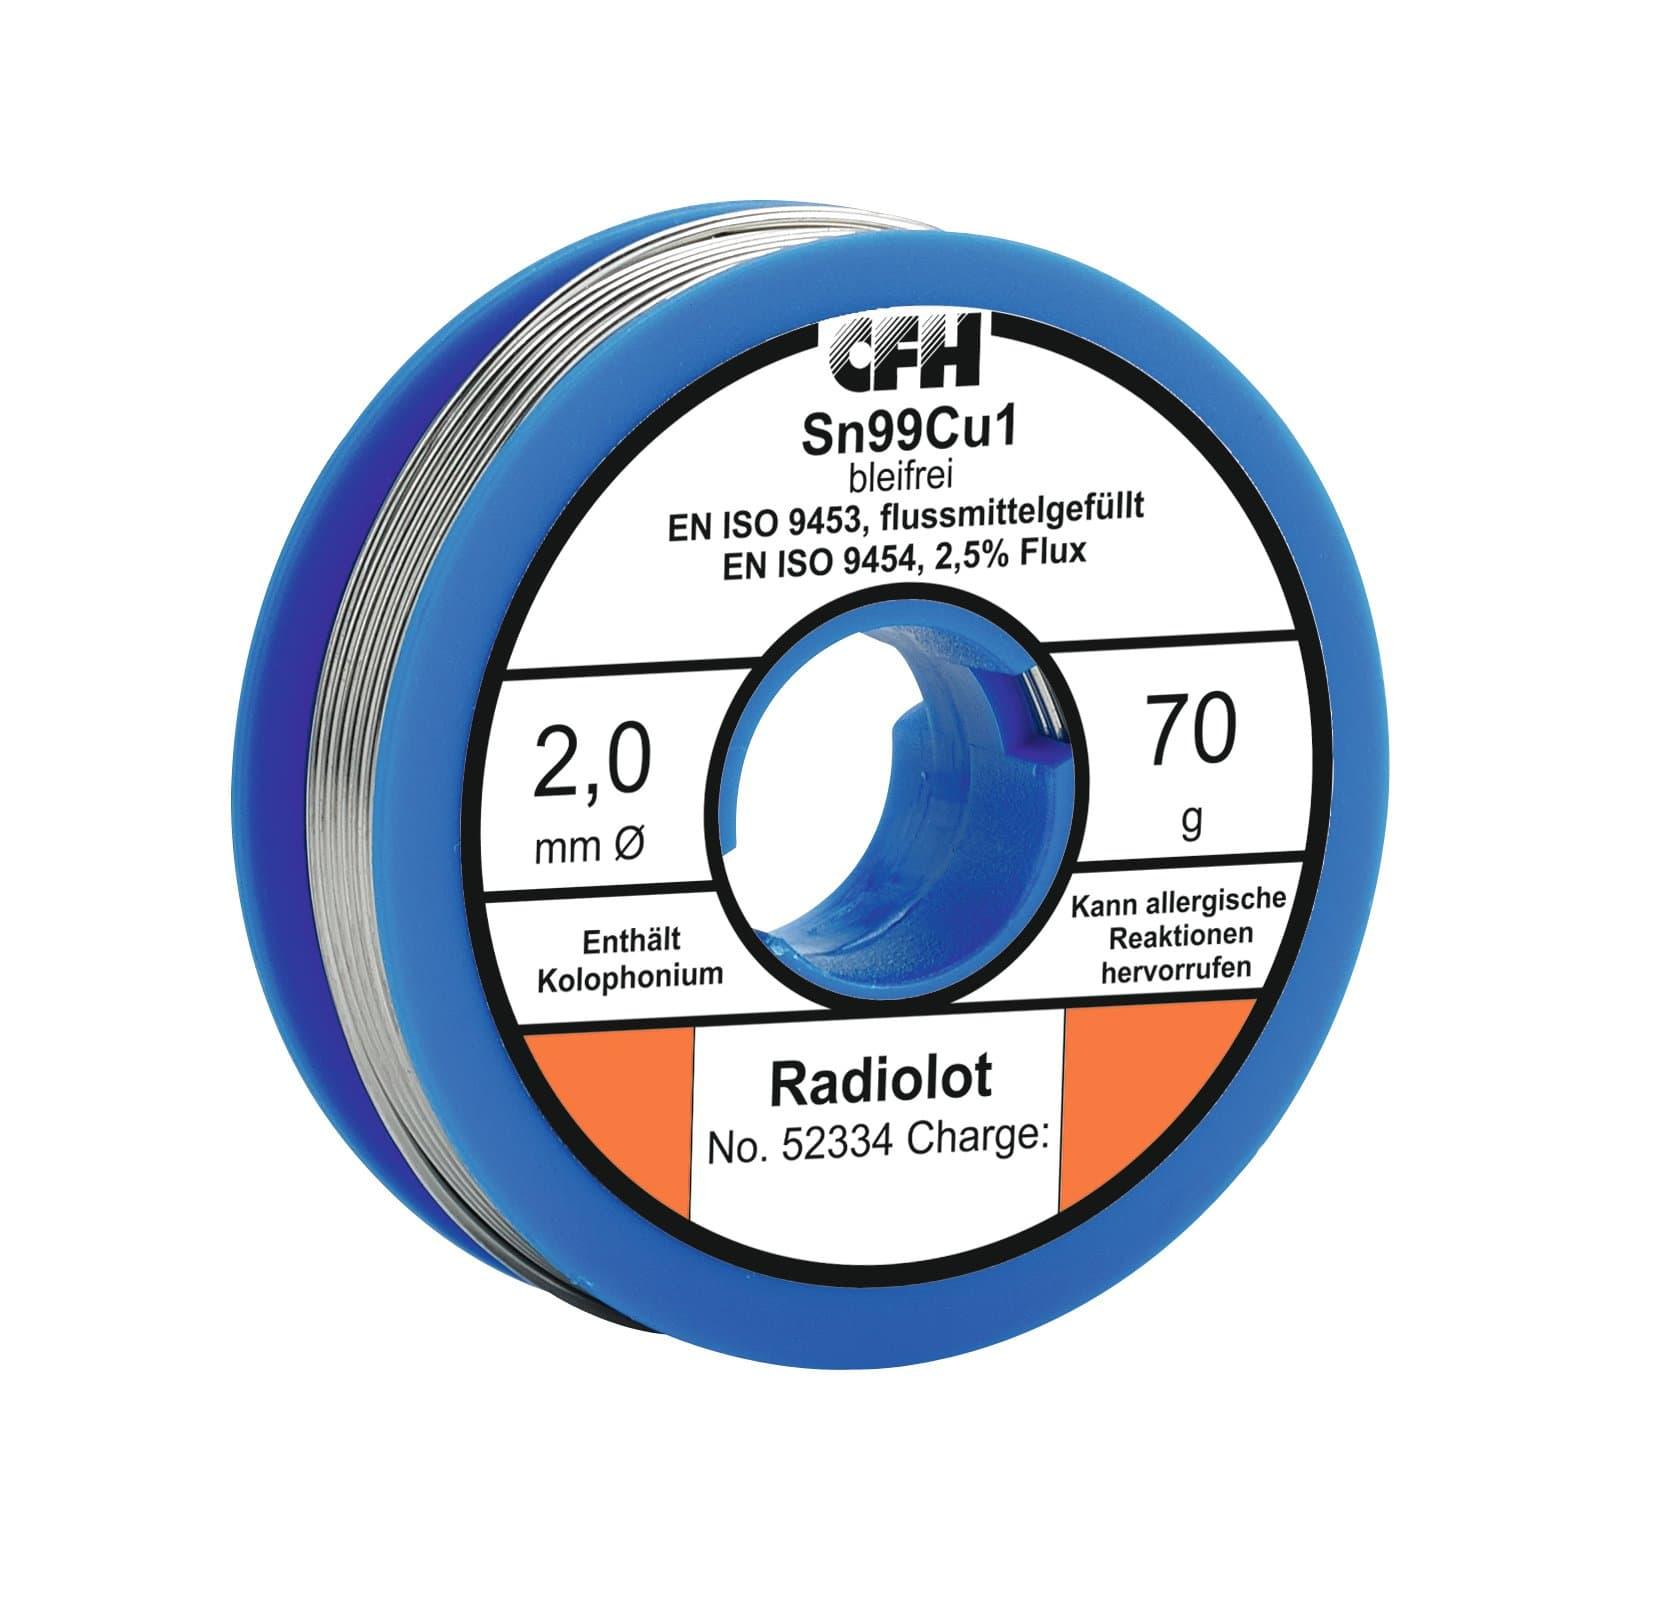 Cfh Radiolot RL 334, bleifrei, 70g Lote